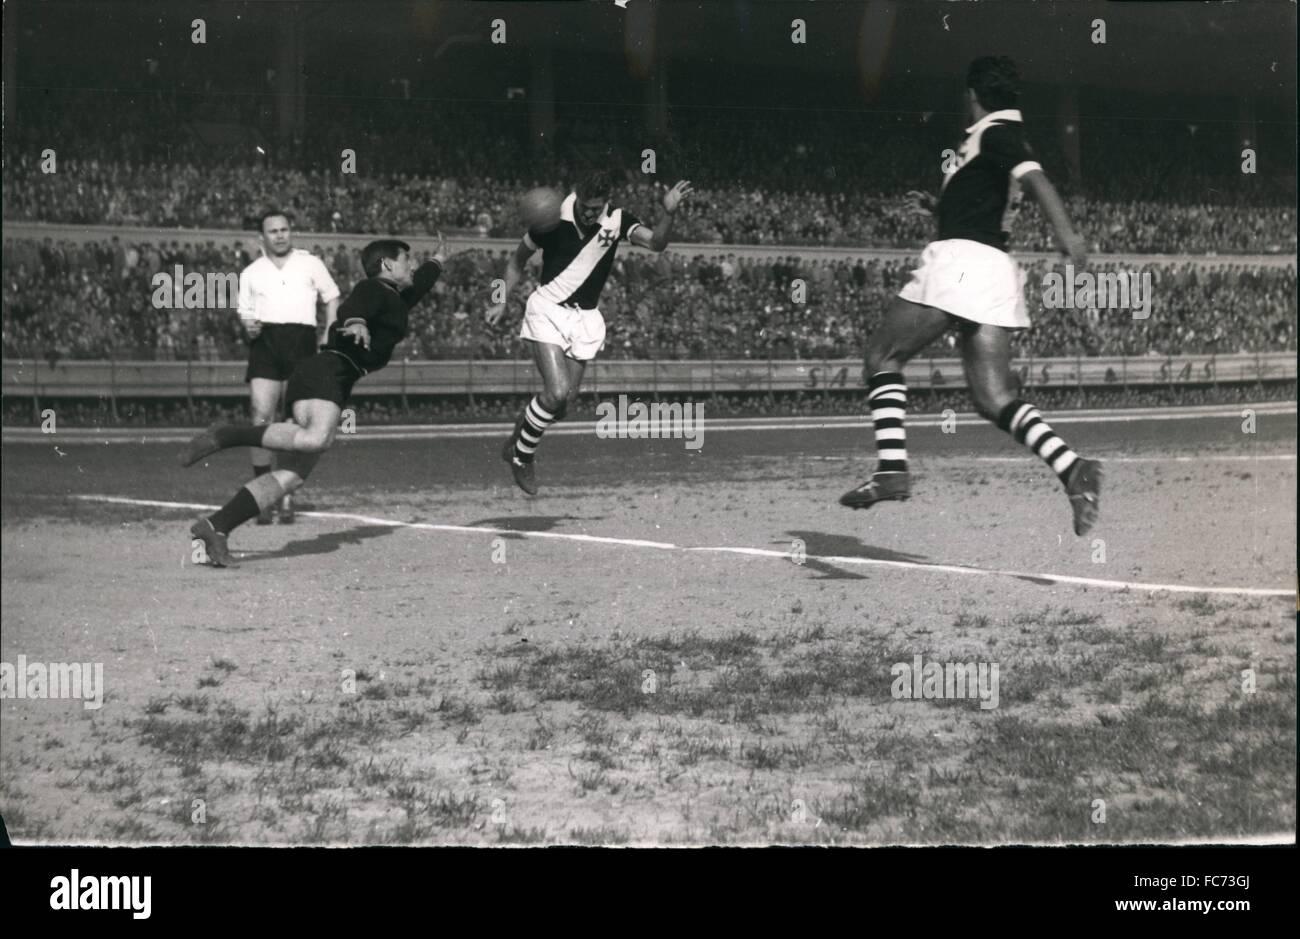 1955 - Famous Brasilian Football Team ''Vasco De Gama in Turkey: Vasco De Gama vs. Besiktas (Istanbul league leader) Stock Photo